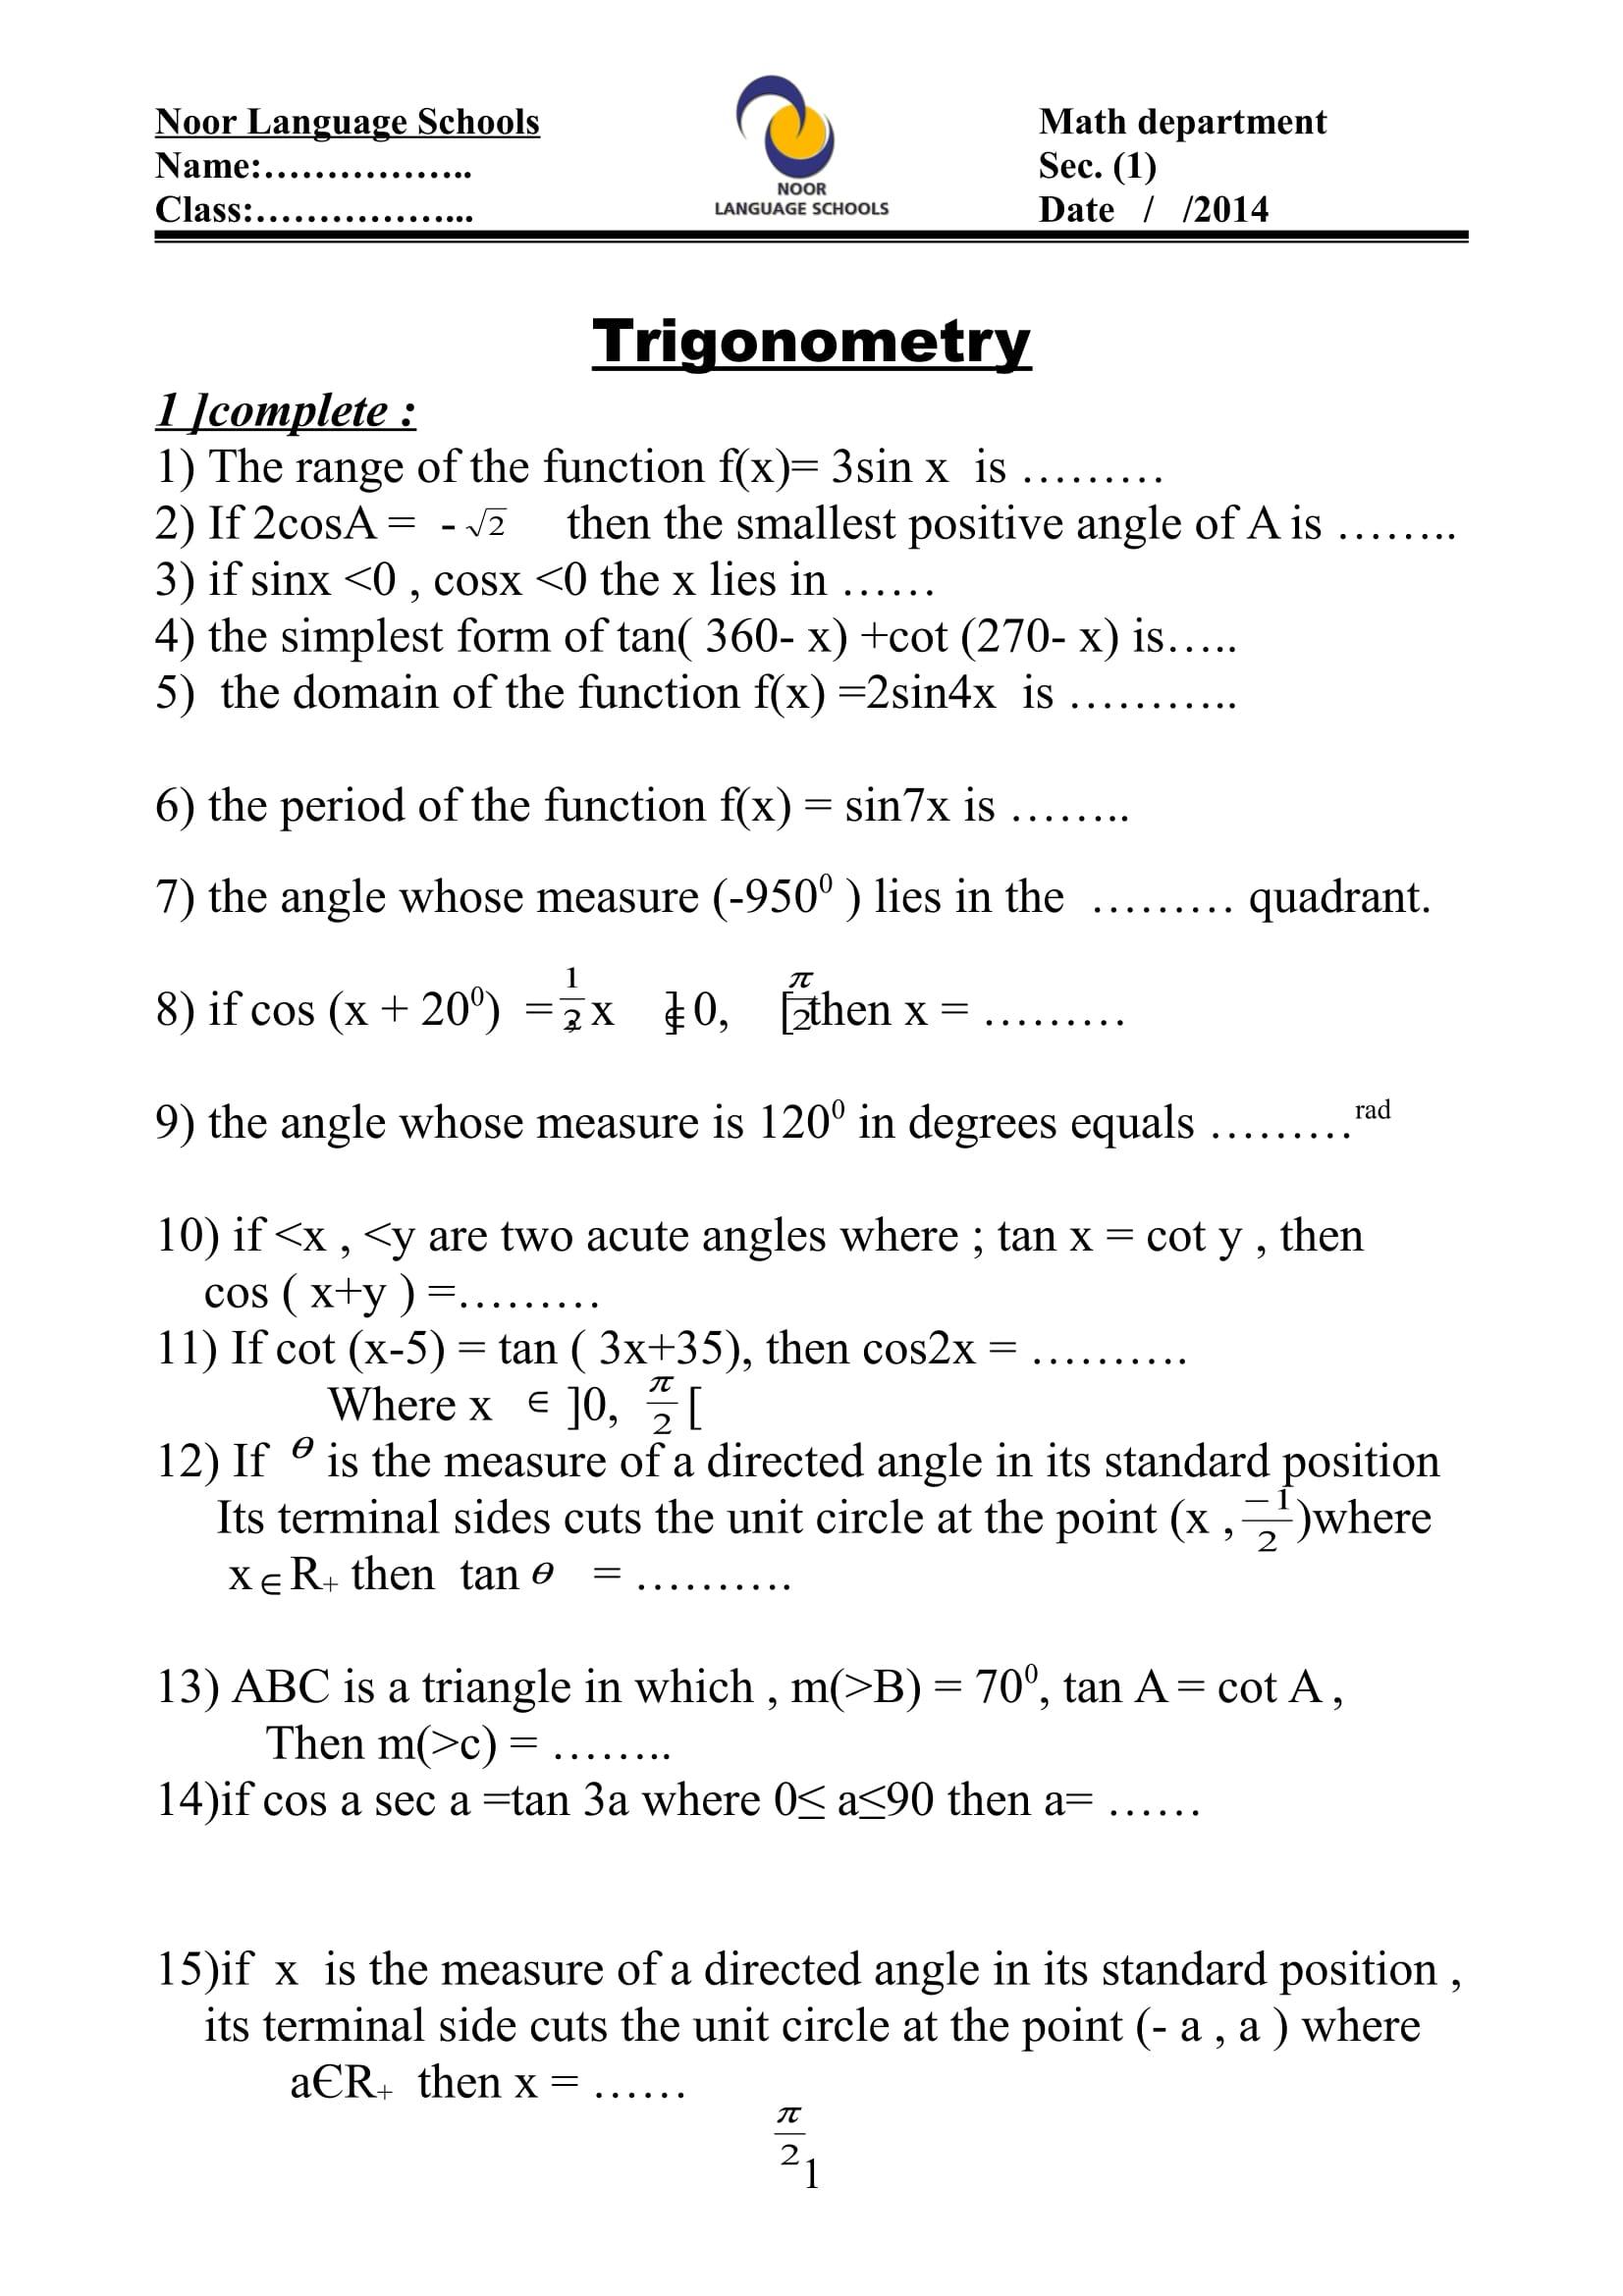 exam-eg.com_1511269979751.jpg